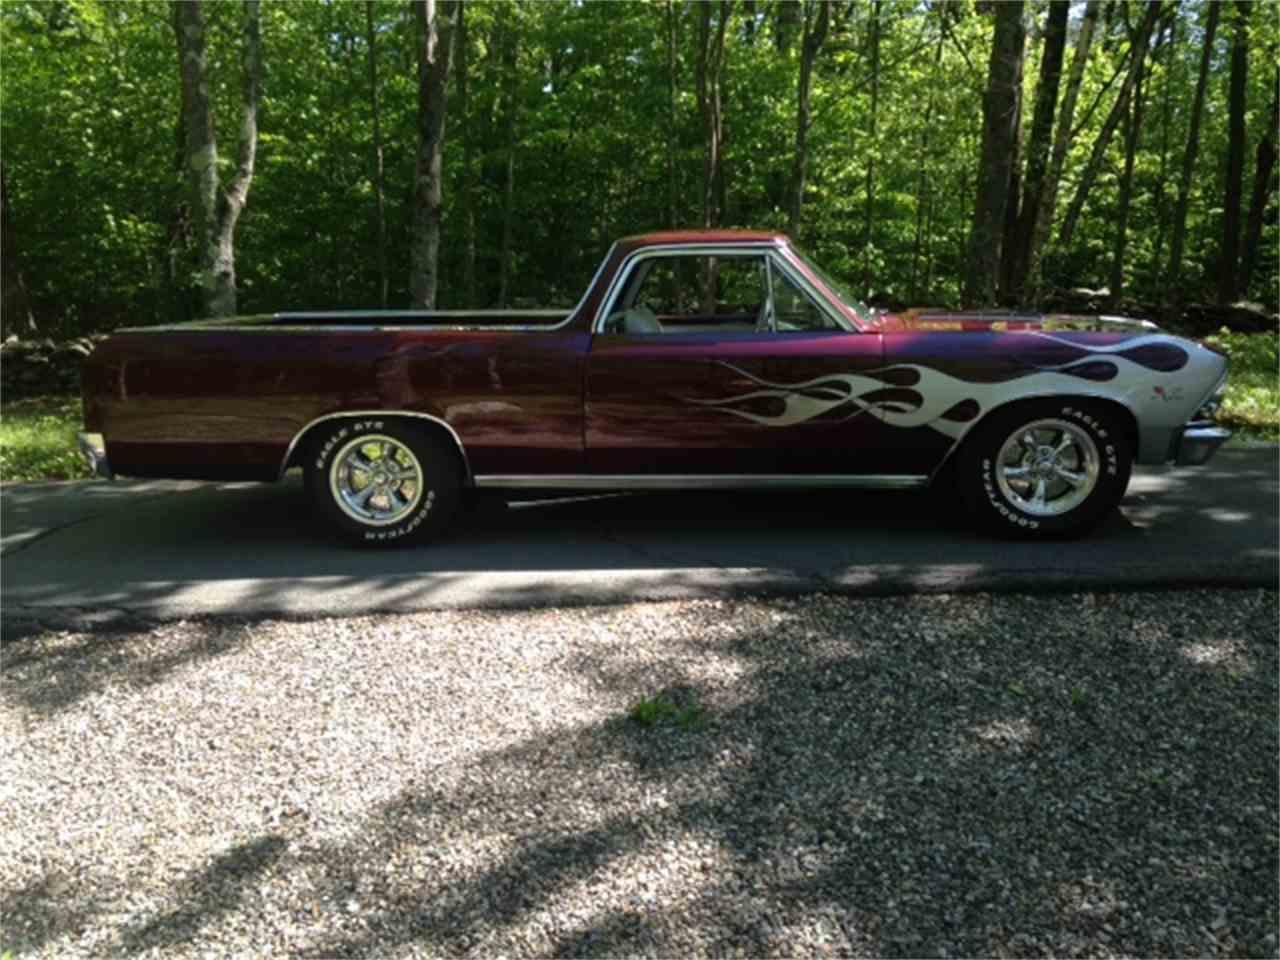 All Chevy 1976 chevy el camino : 1966 Chevrolet El Camino for Sale on ClassicCars.com